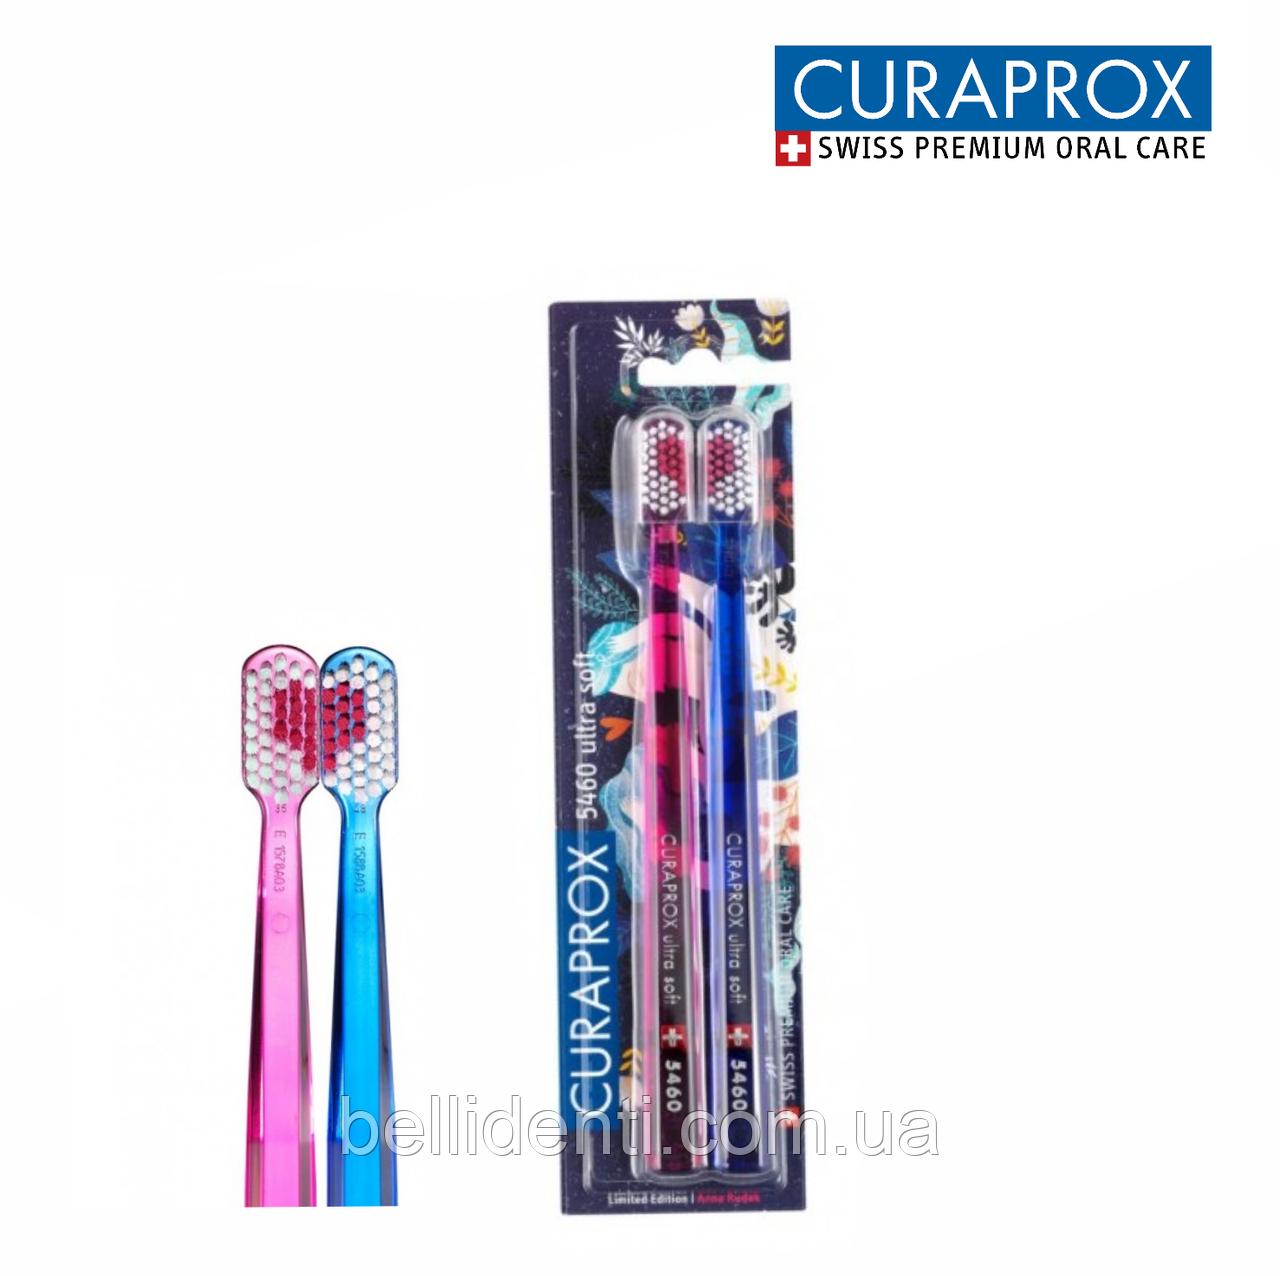 Набор зубных щеток Curaprox LOVE Ultra Soft, d 0,10 мм, 2 шт